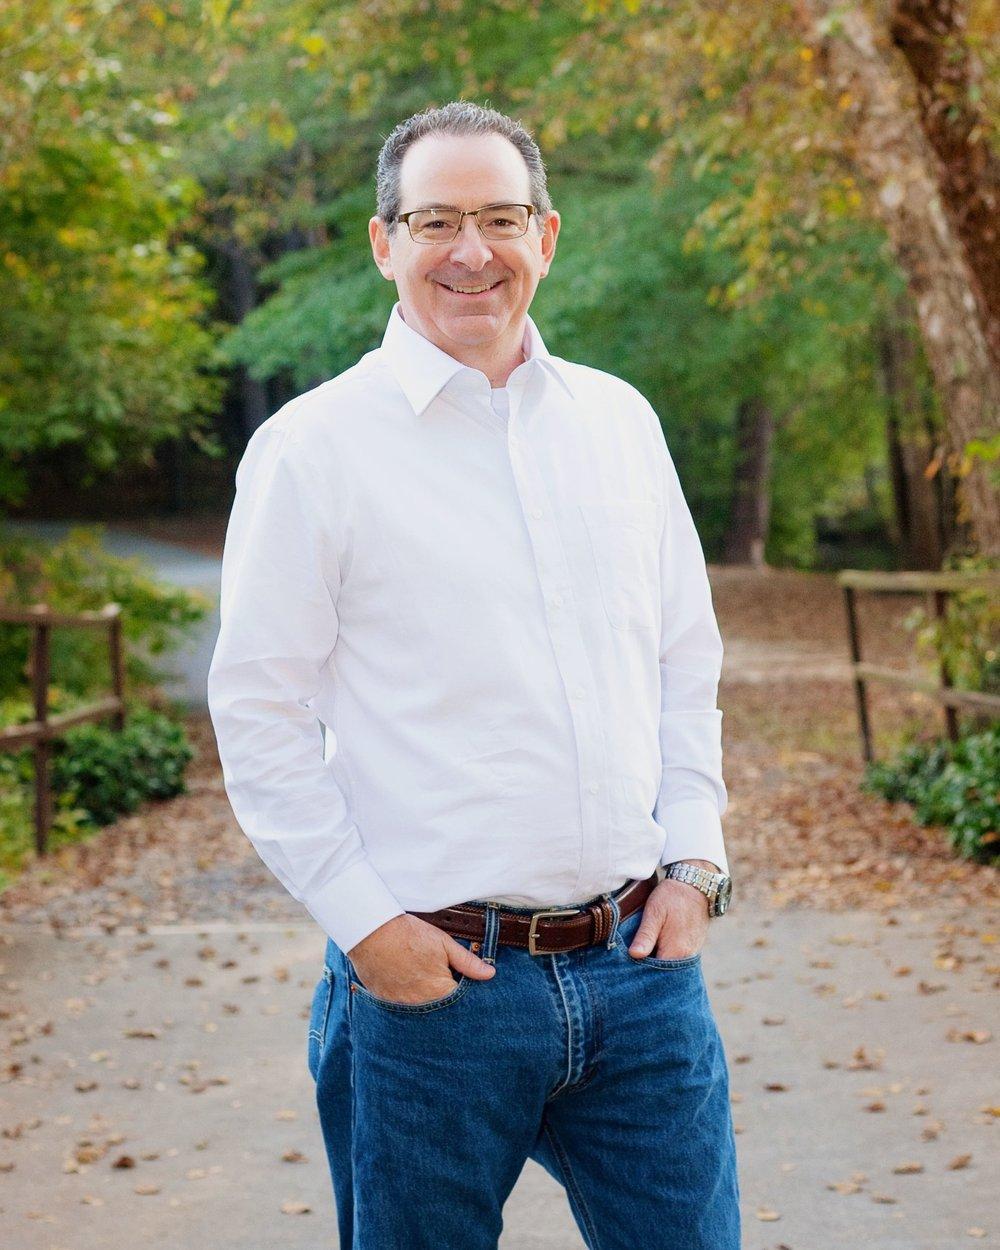 Dr. Michael Mahaffey